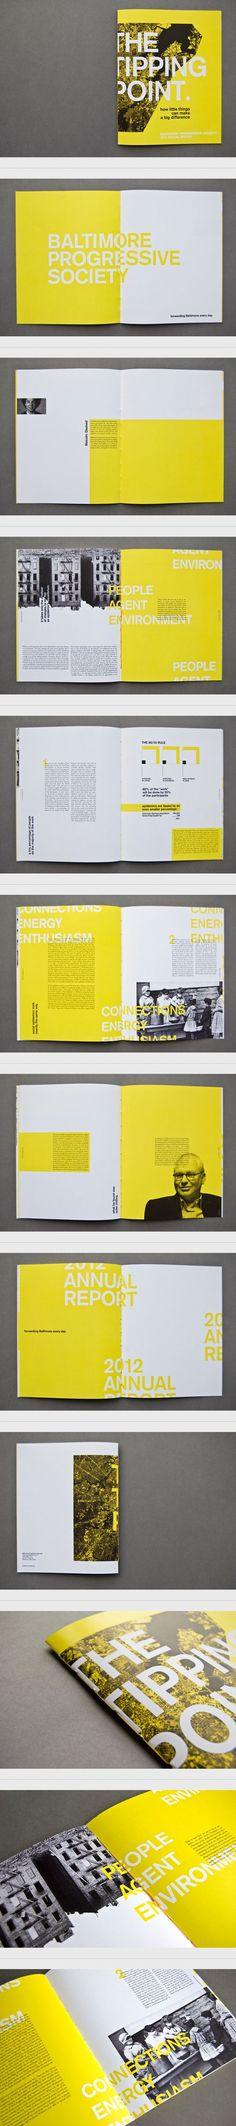 2 colores, un audaz amarillo y un negro acompañante // The Tipping Point: Annual Report: